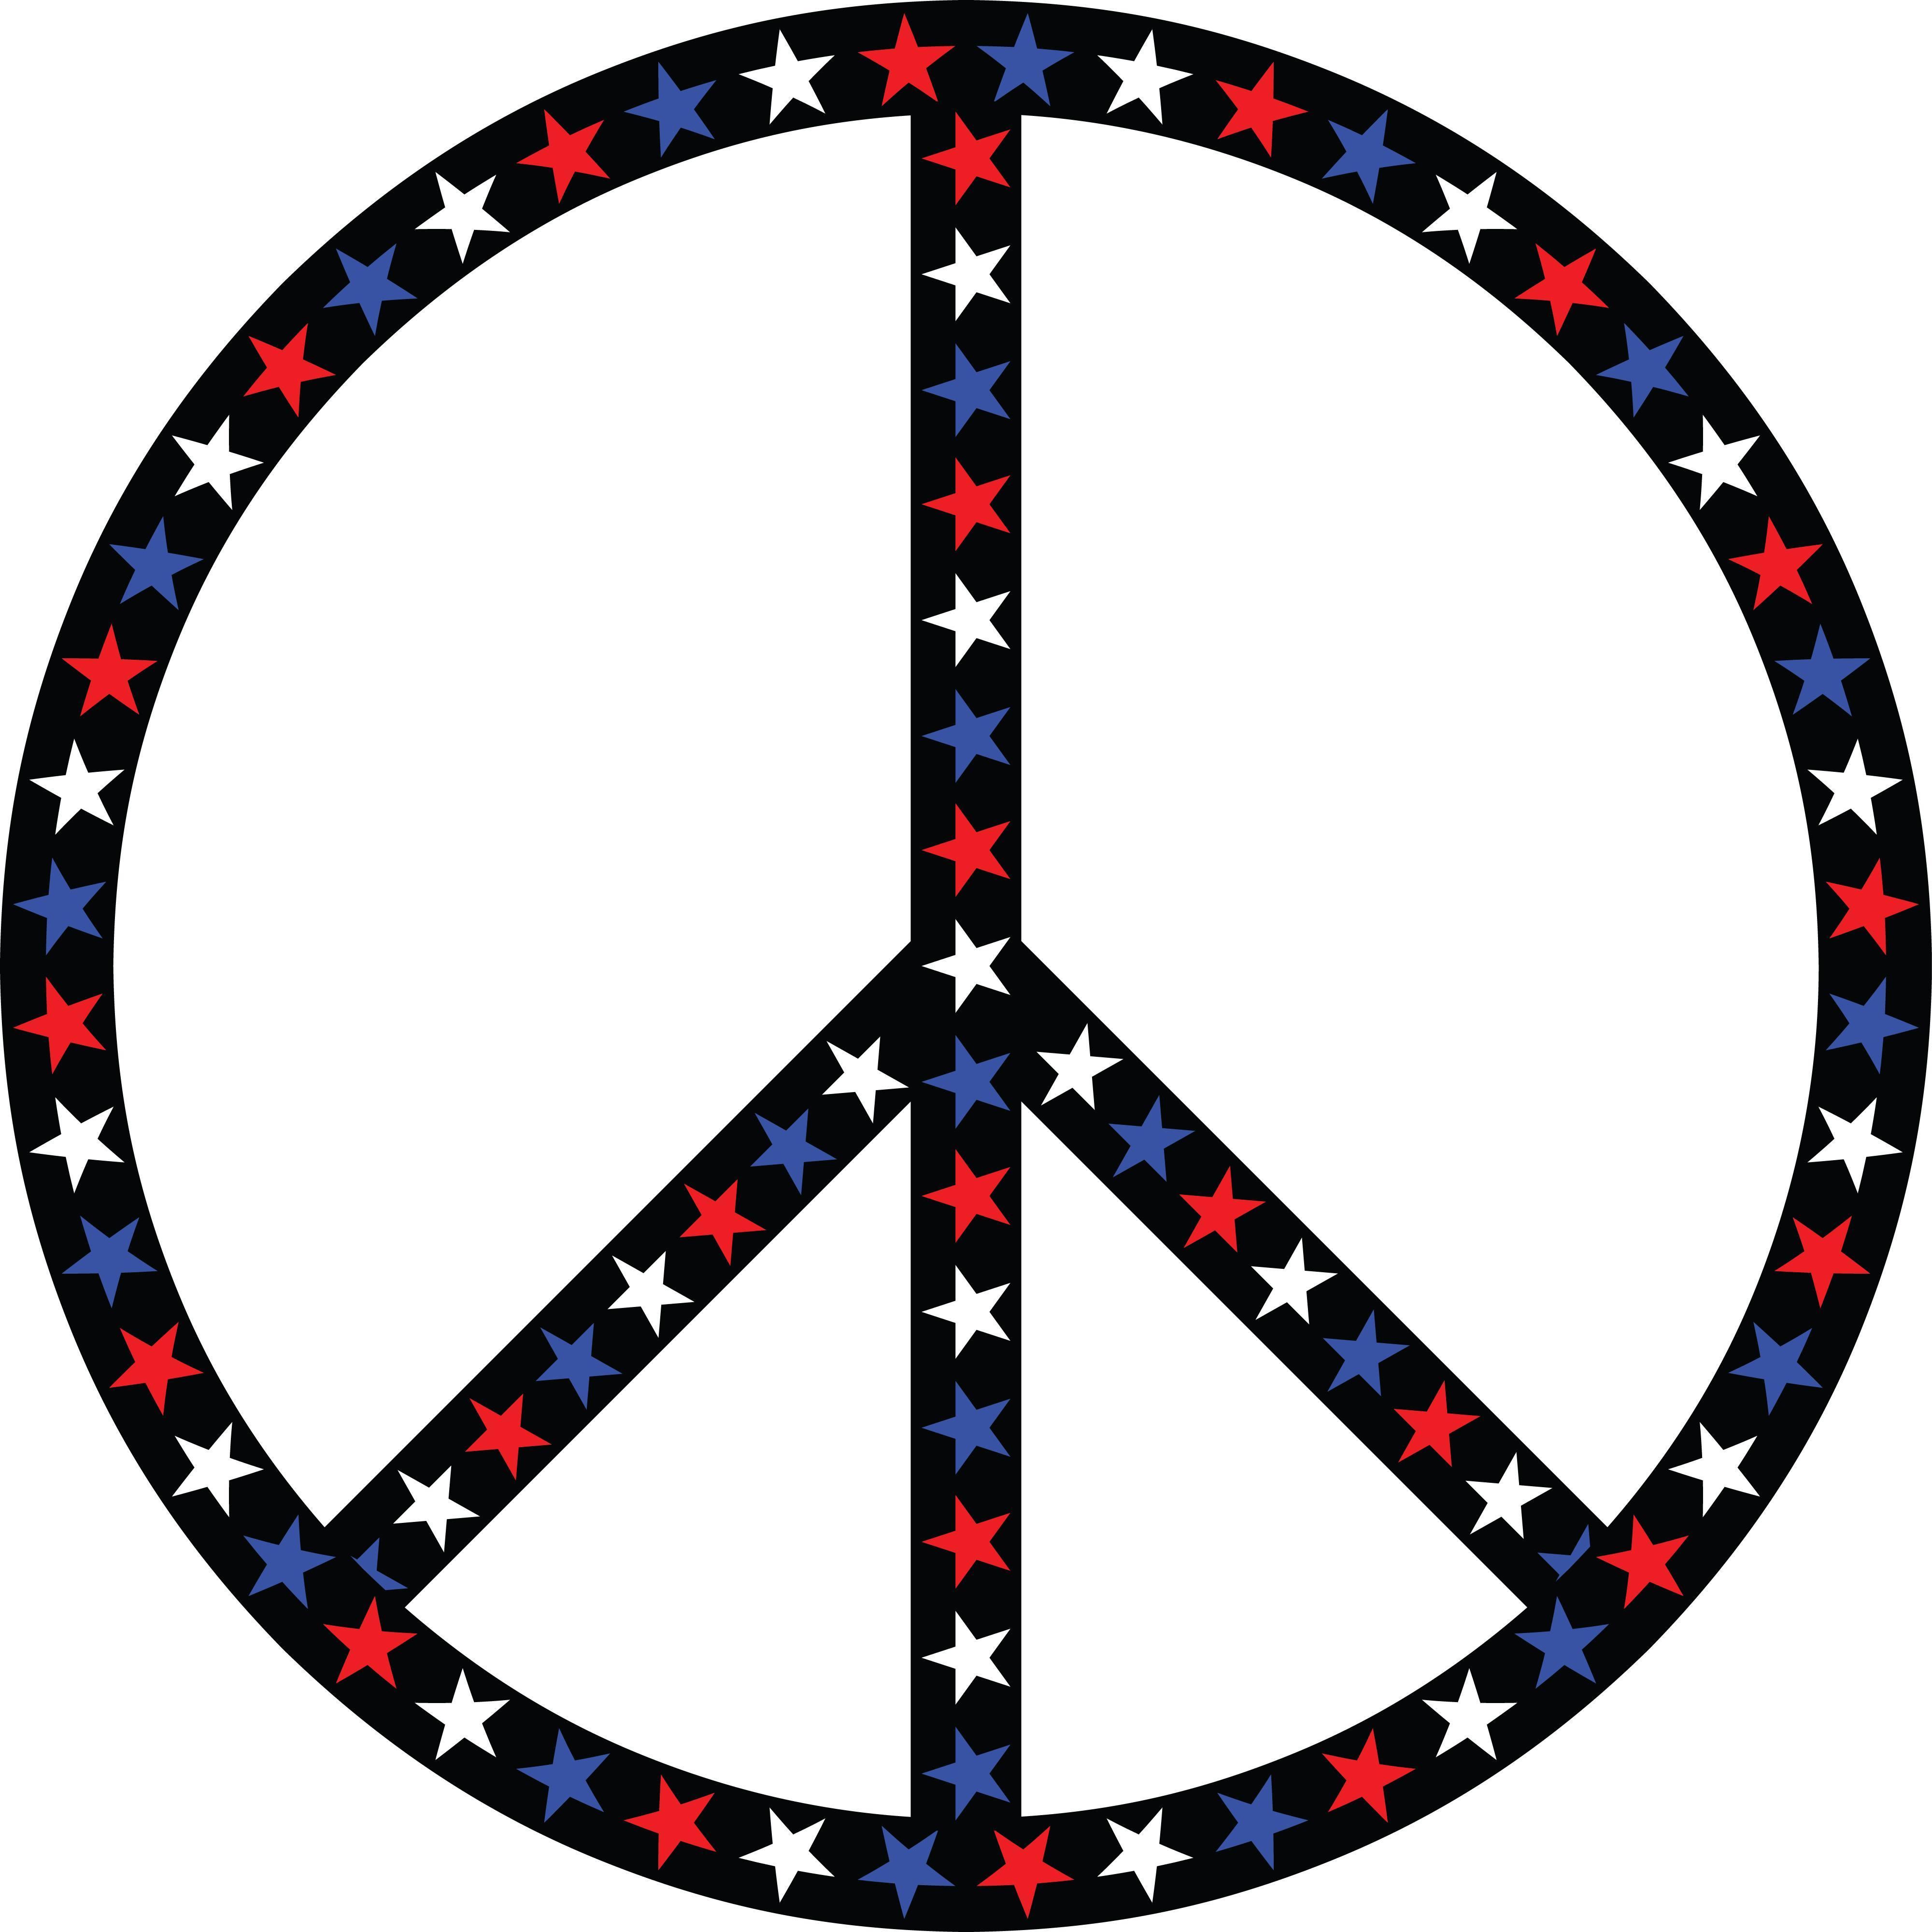 Best Free Patriotic Symbols Clip Art Image » Free Vector Art, Images.